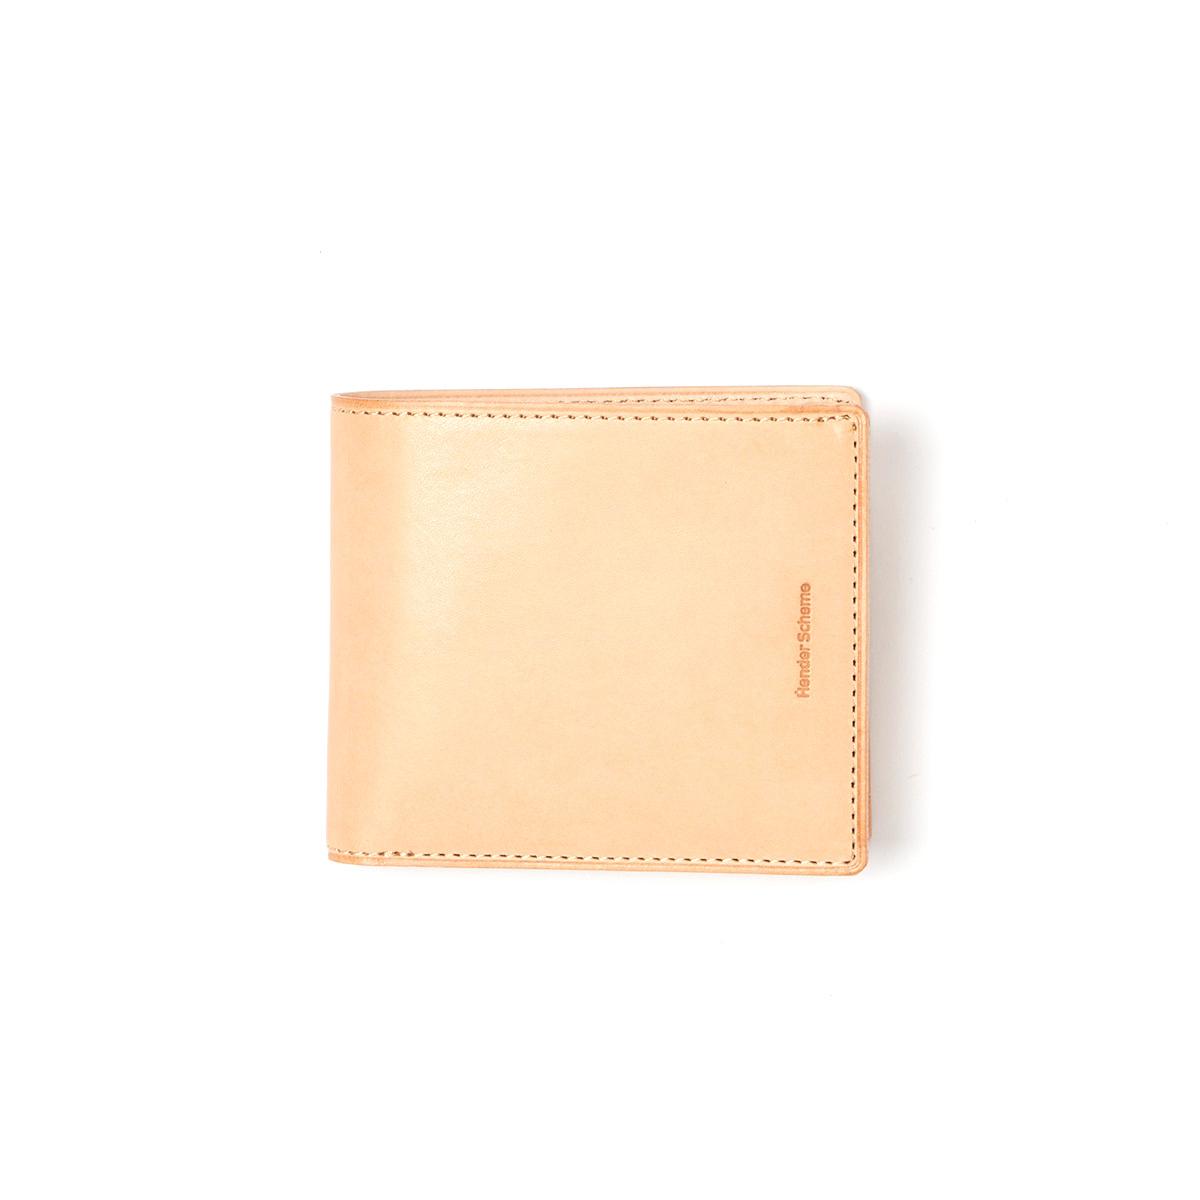 Hender Scheme / half folded wallet -Natural